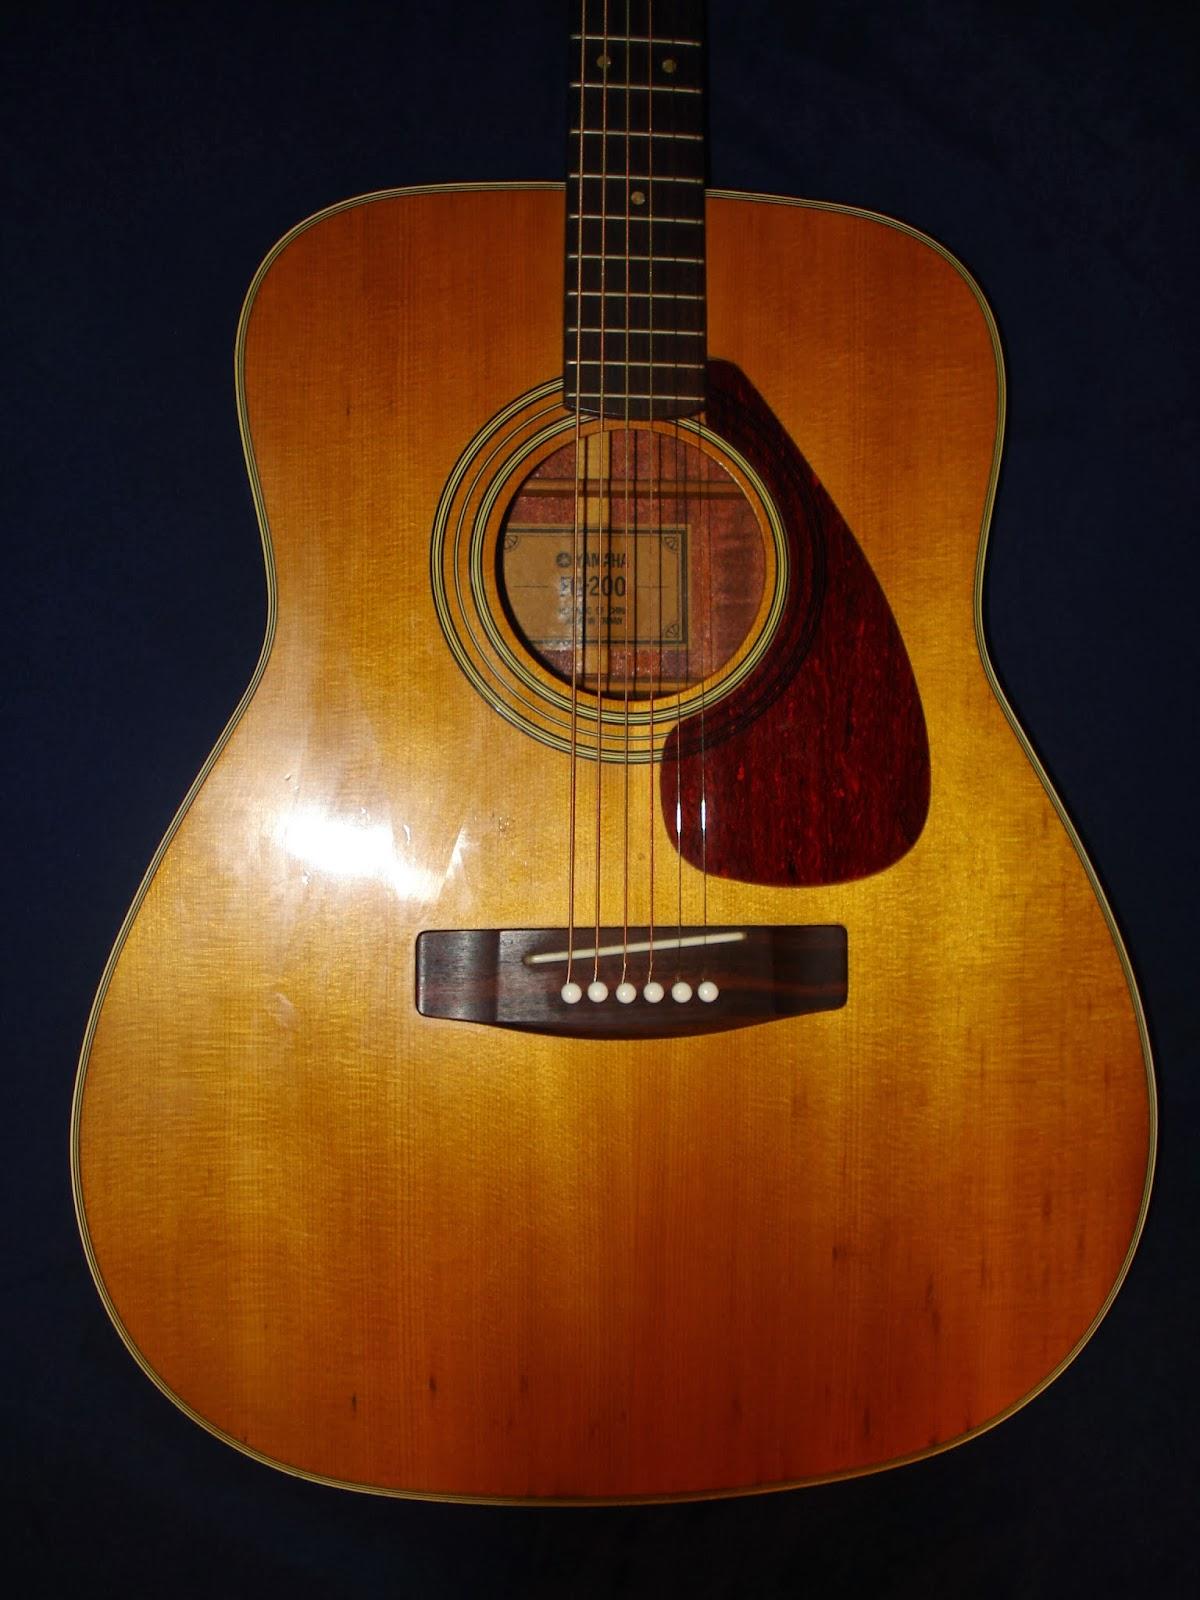 socal gear museum 1974 yamaha fg 200 acoustic guitar. Black Bedroom Furniture Sets. Home Design Ideas